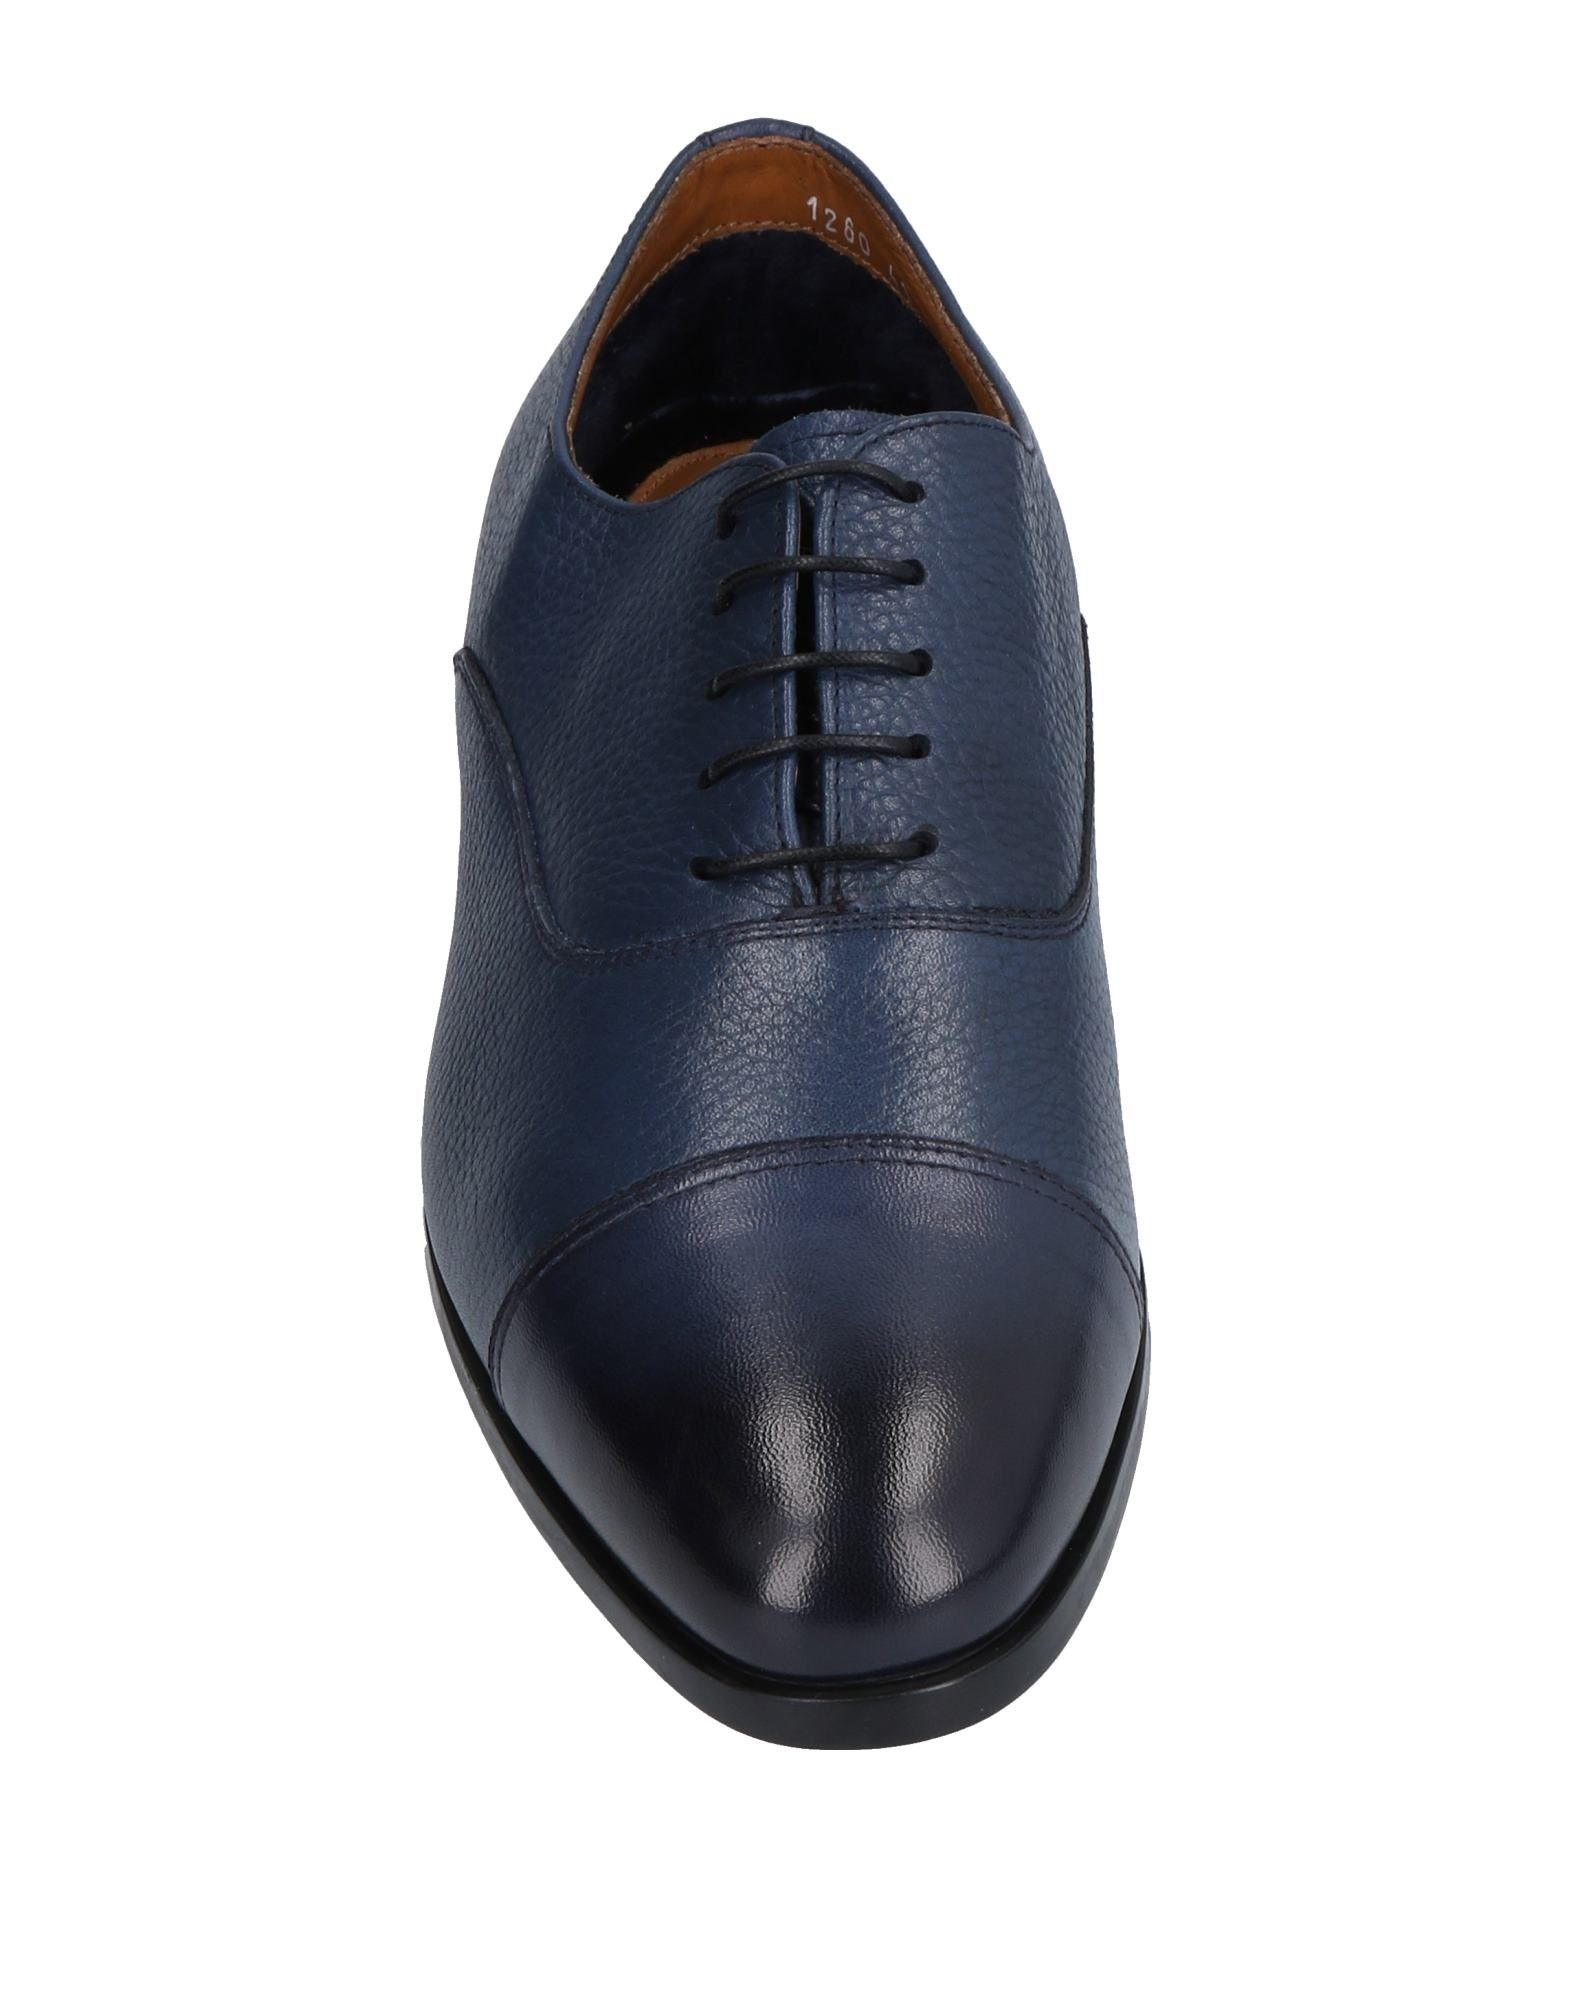 Rabatt Rabatt Rabatt echte Schuhe Doucal's Schnürschuhe Herren  11506694XW a309ea